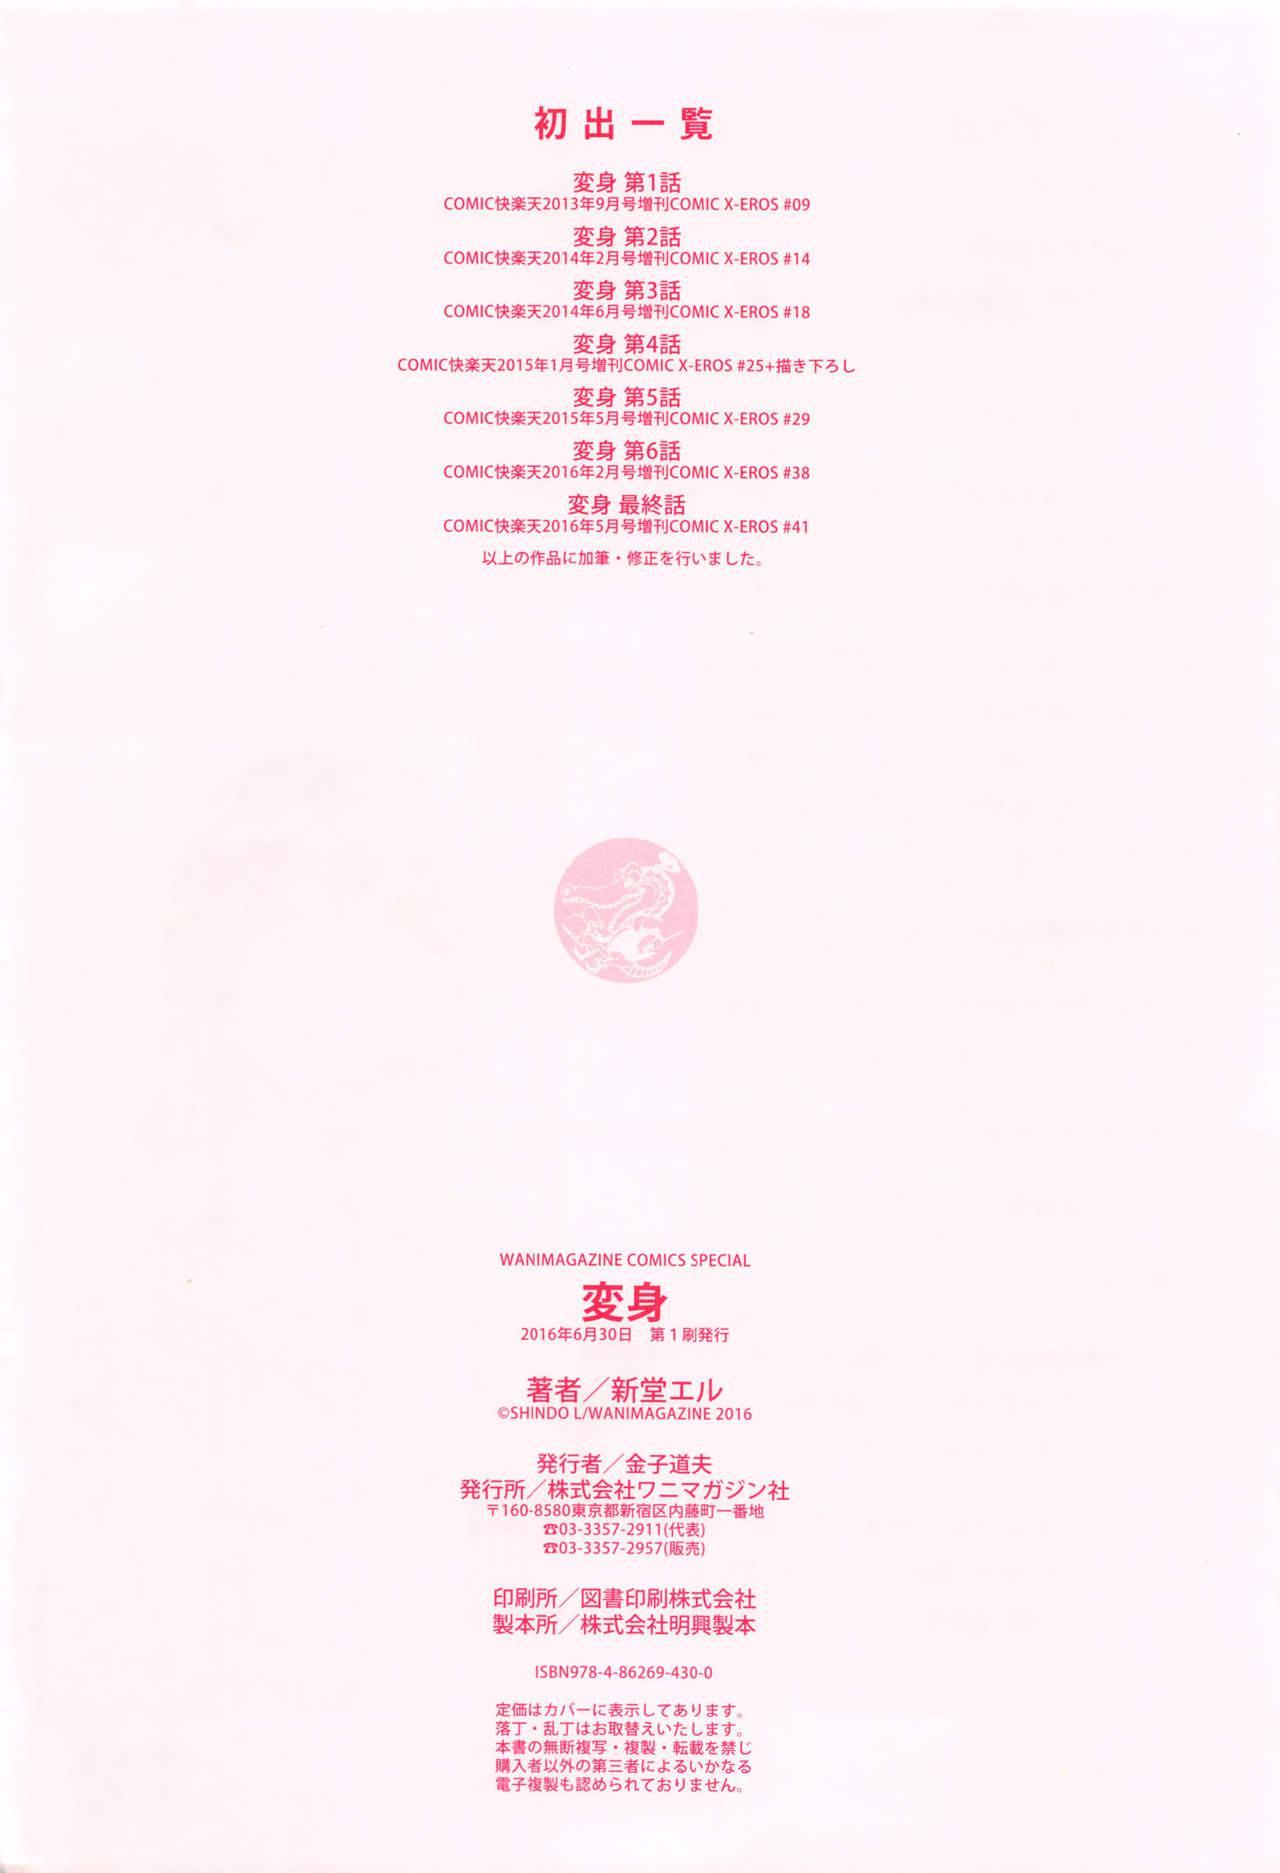 Henshin + 4P leaflet 247